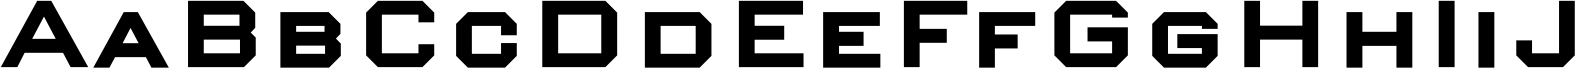 Nex Star